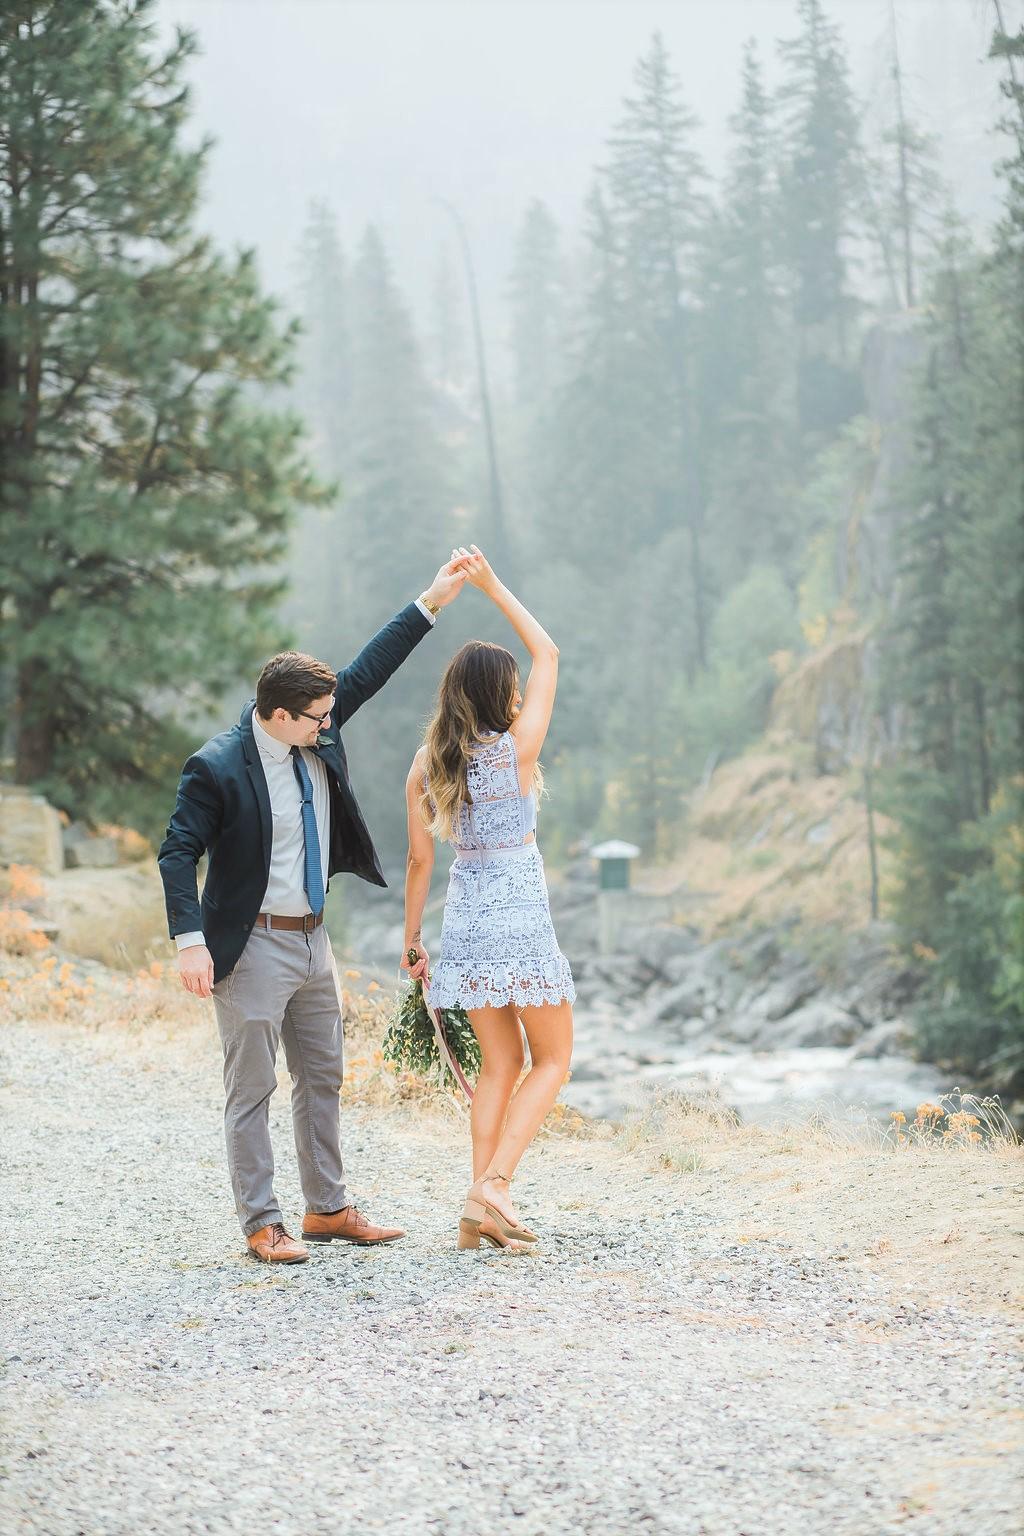 adorable engagement photos